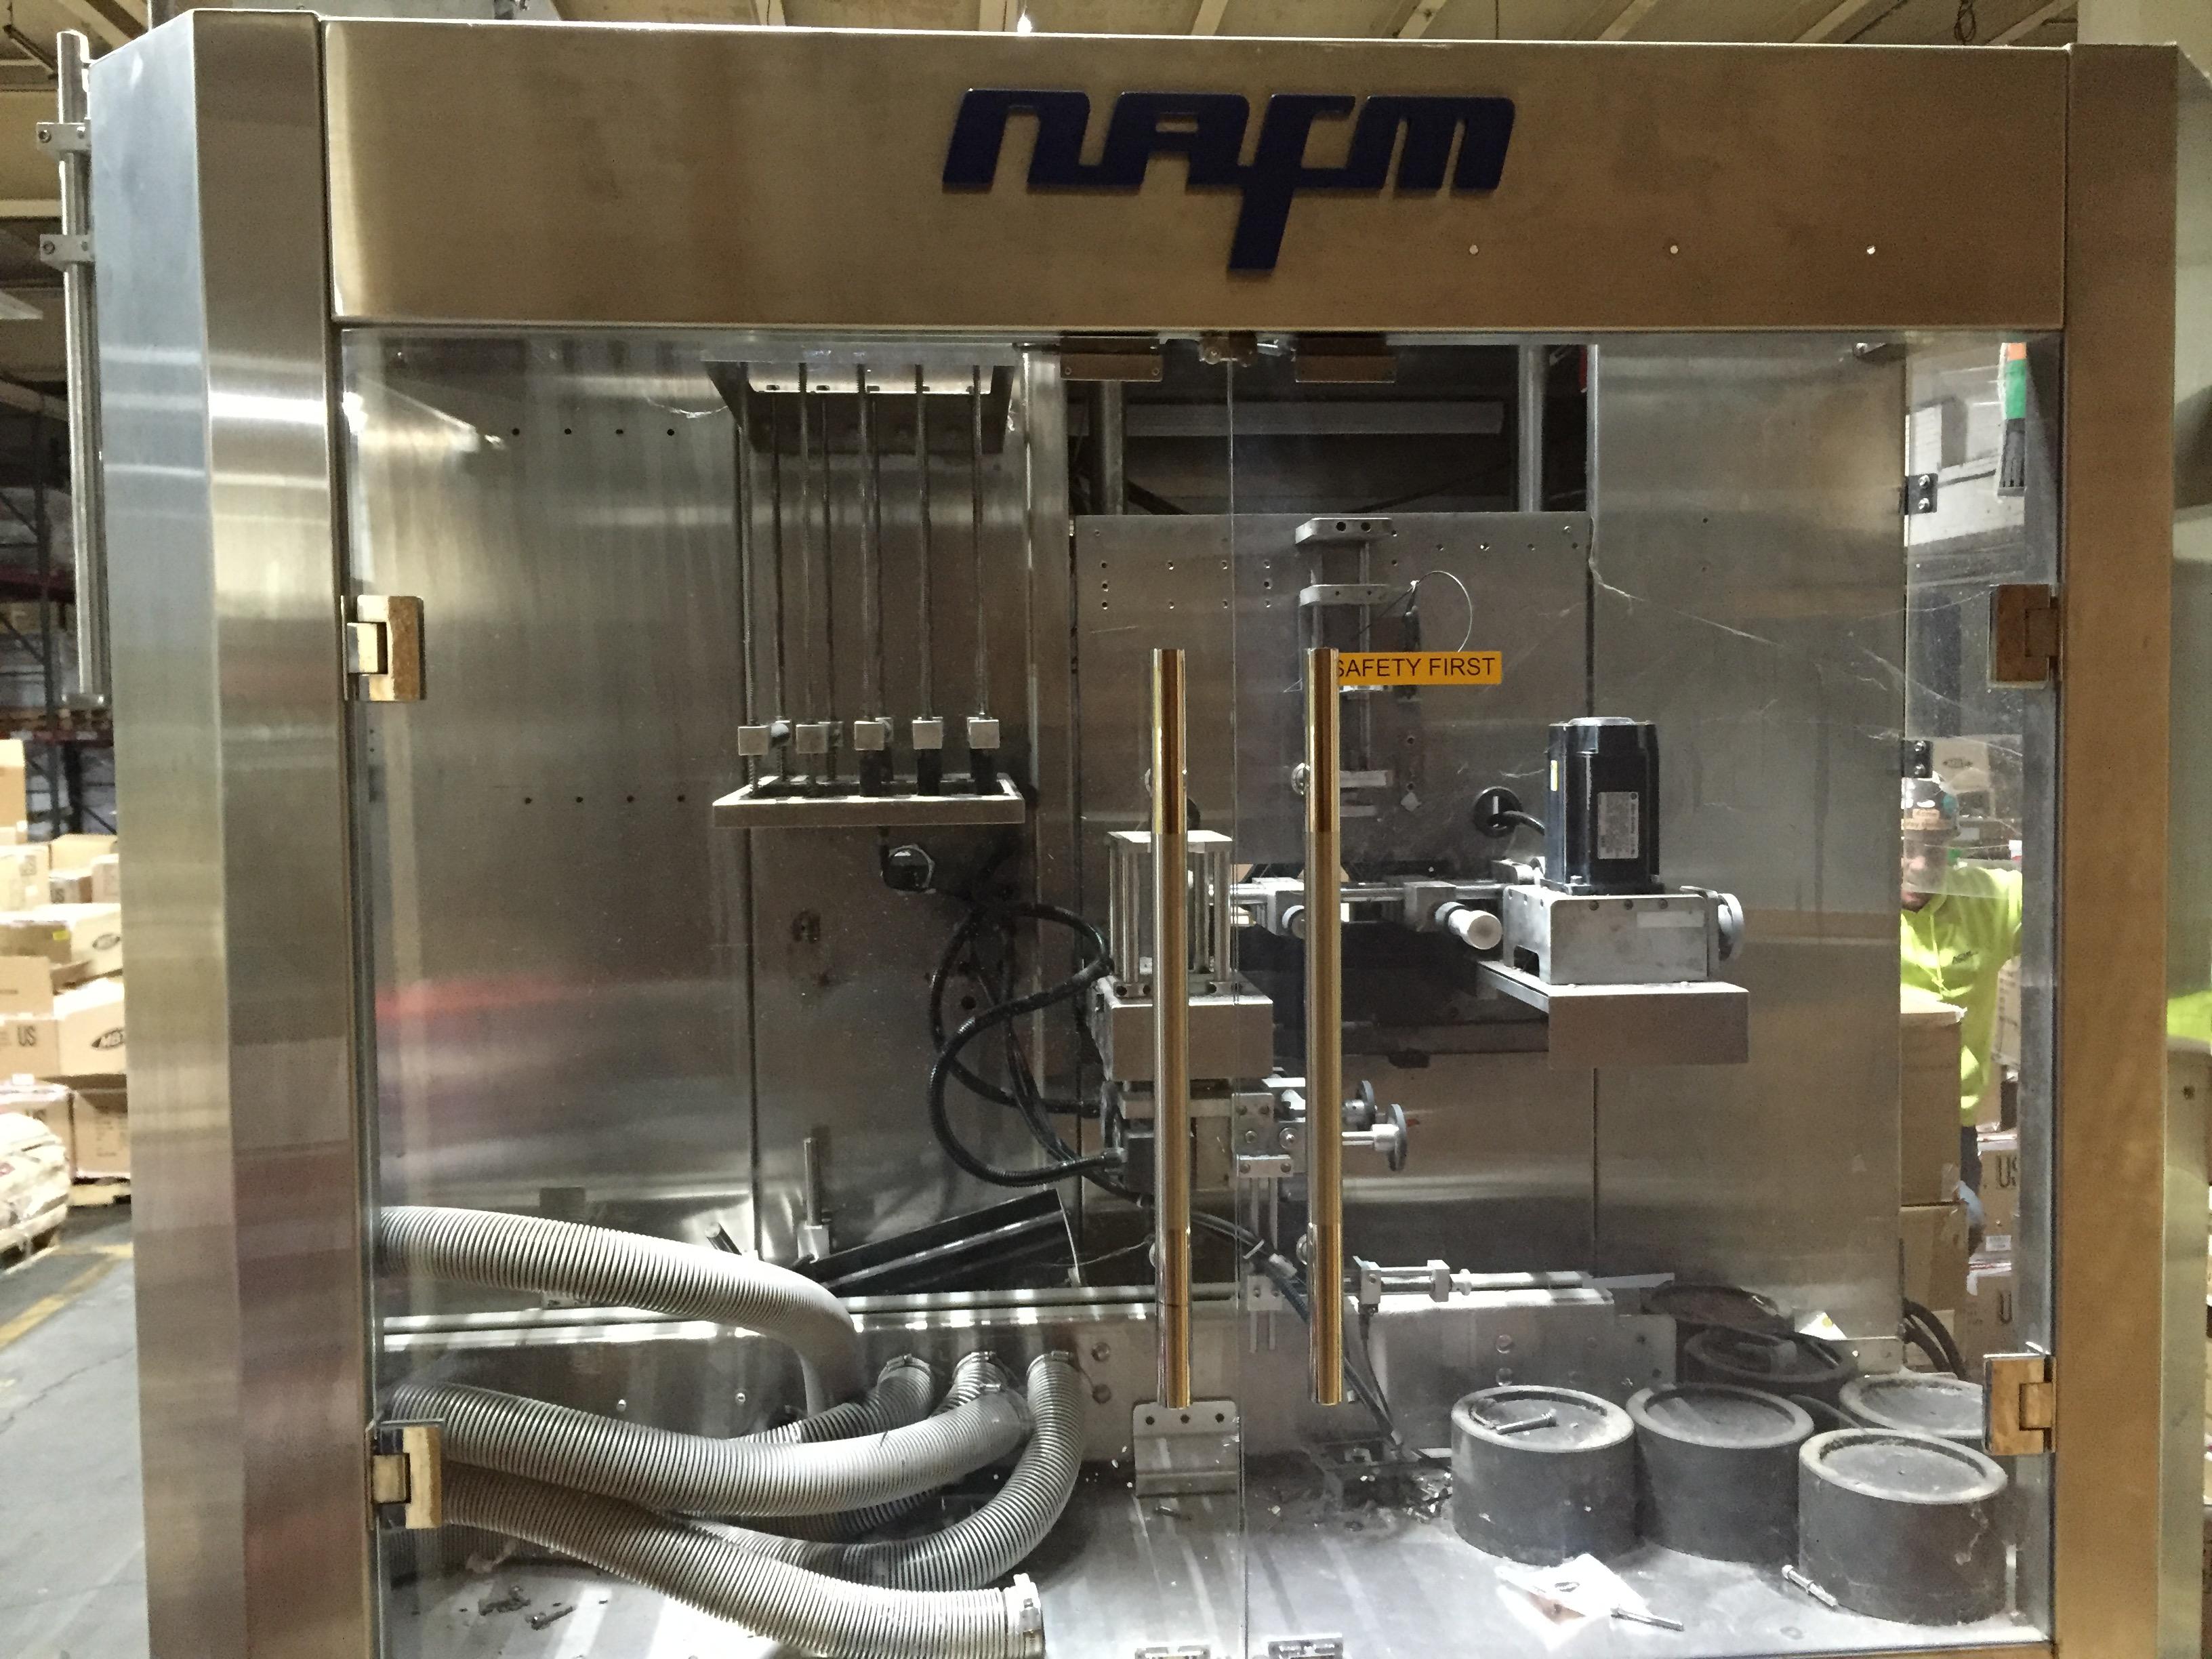 Lot 75 - NAFM,LX-500,Inline Shrink labelng Machine, SN: 0618NAFM-10170021, Mfg. 10/17/2011 :equipment located